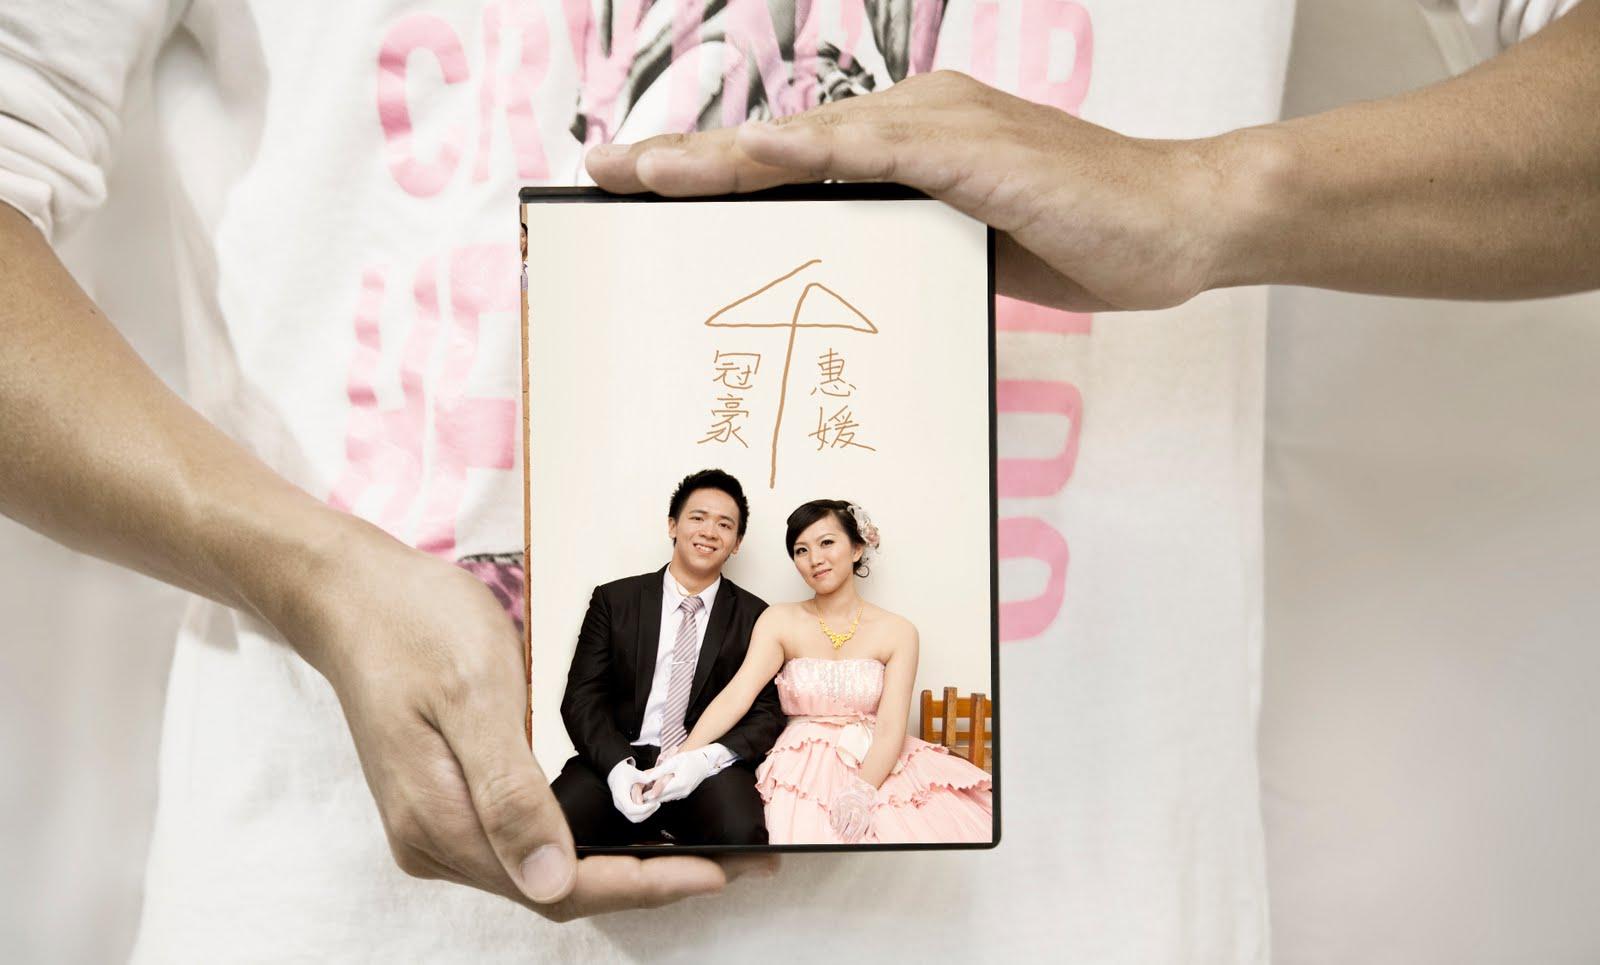 Showcase作品展示 | 冠豪×惠媛婚攝DVD封面設計 by MUMULab.com